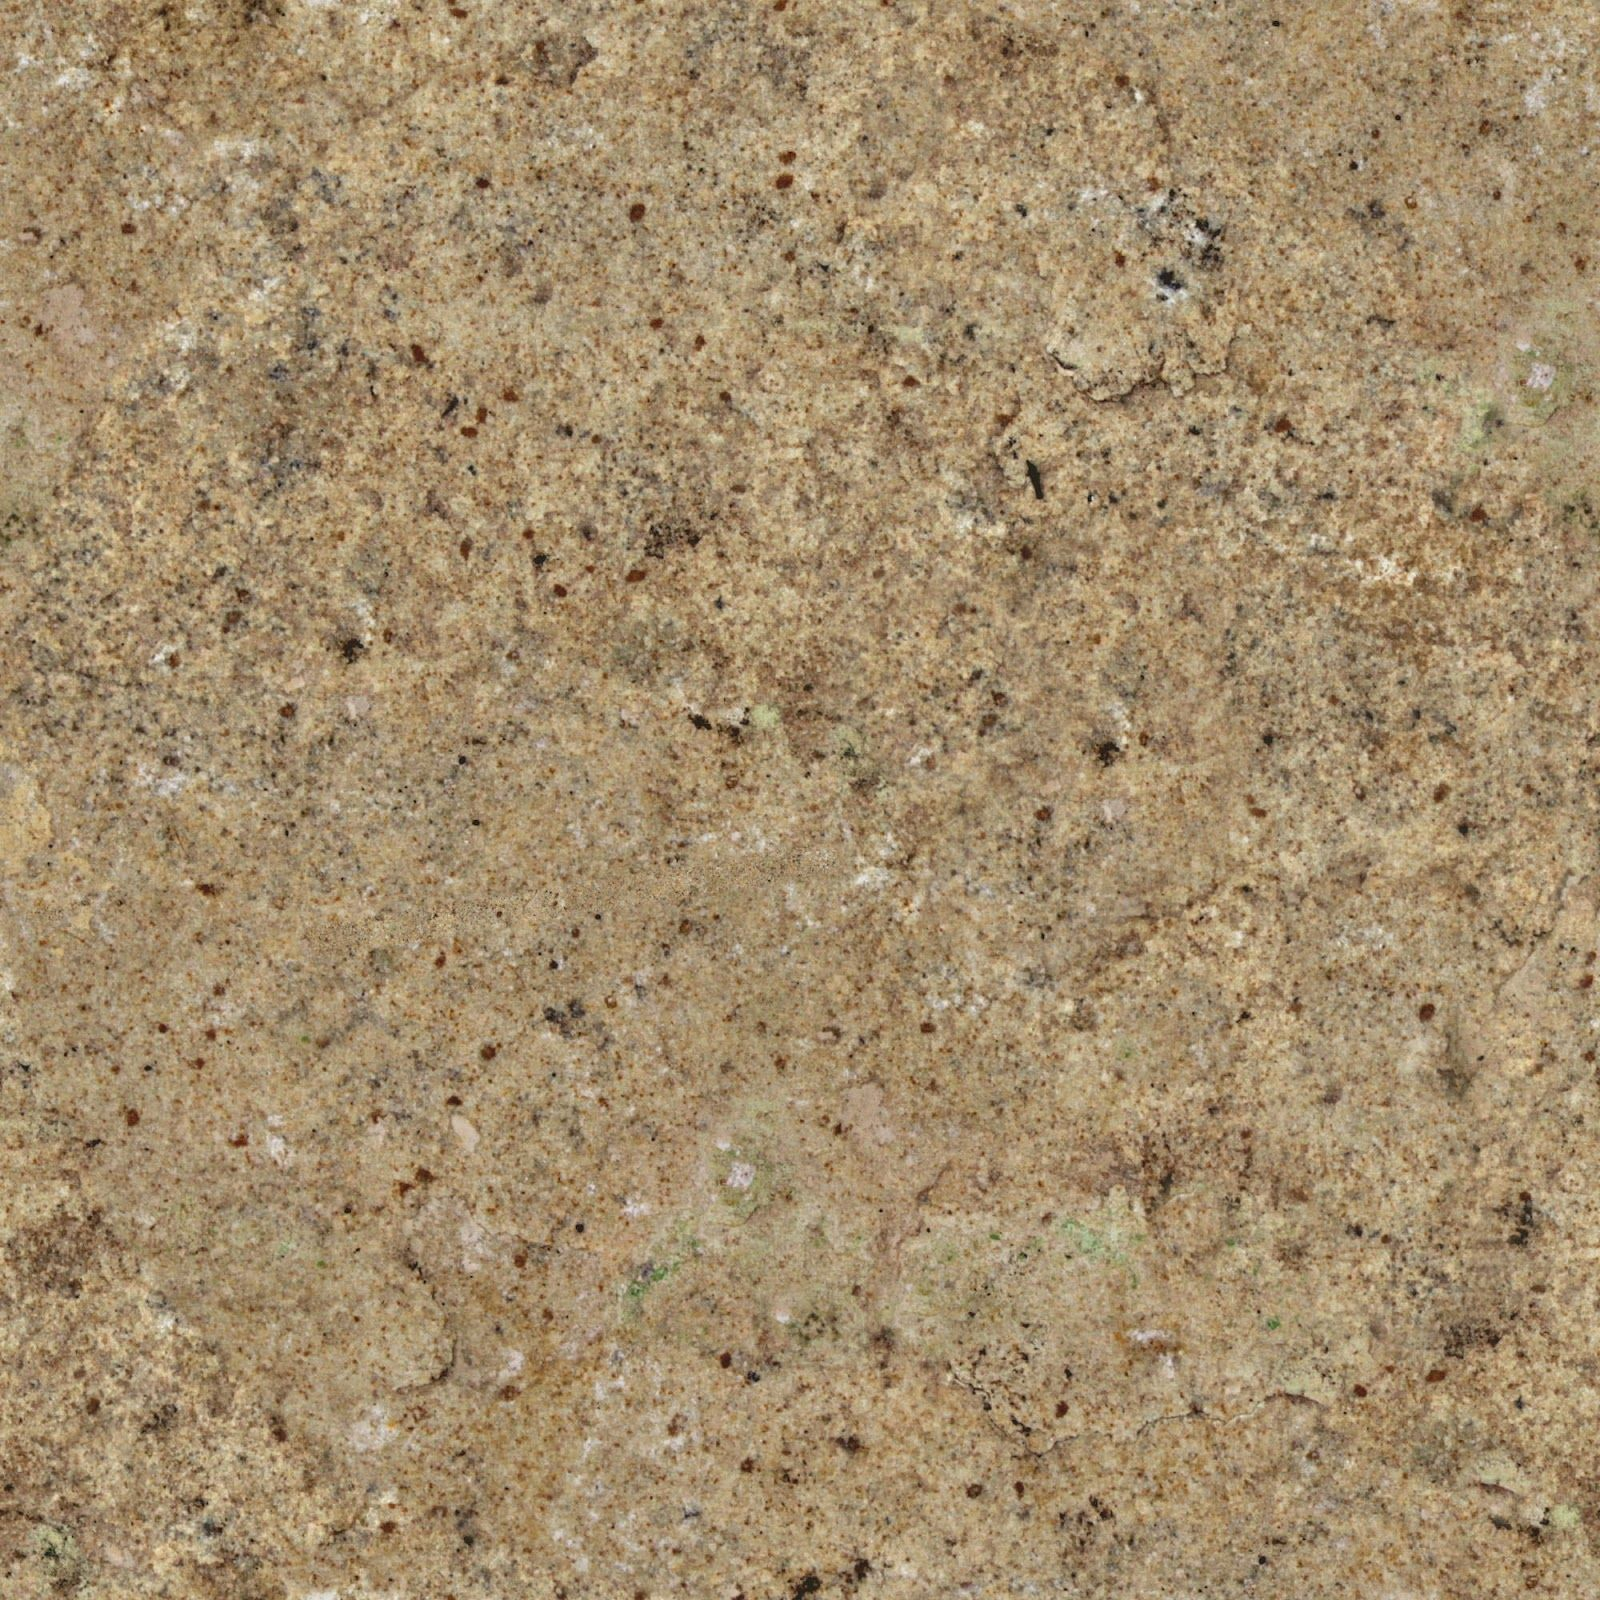 Seamless Stone Texture 289 29 Jpg 1600 1600